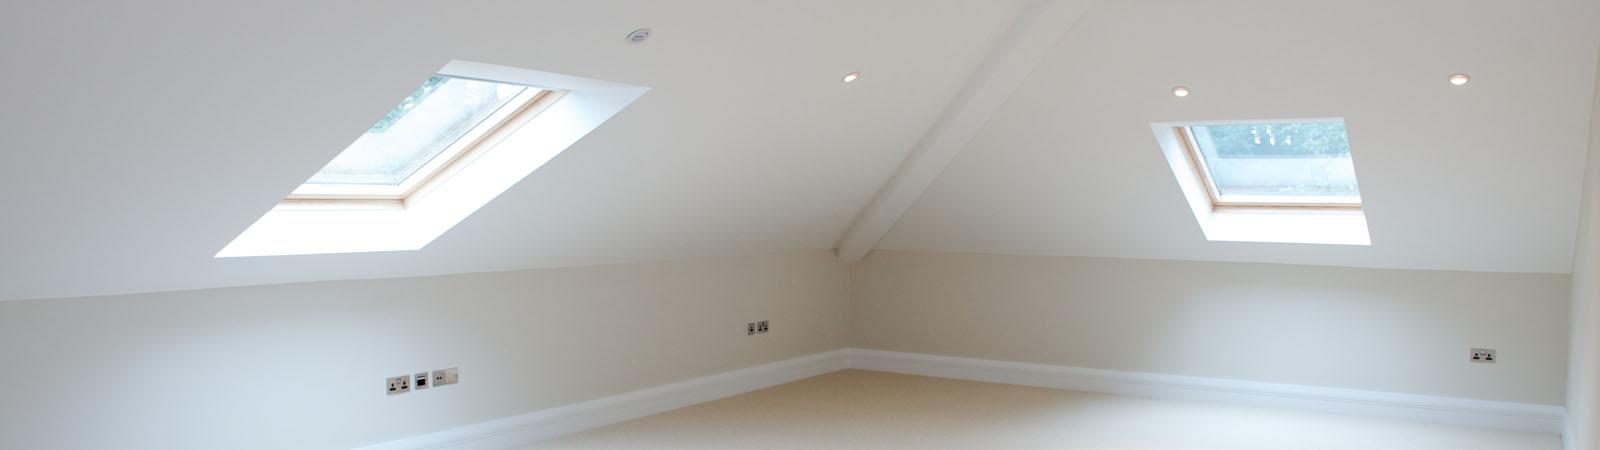 Loft conversion - windows on an empty room